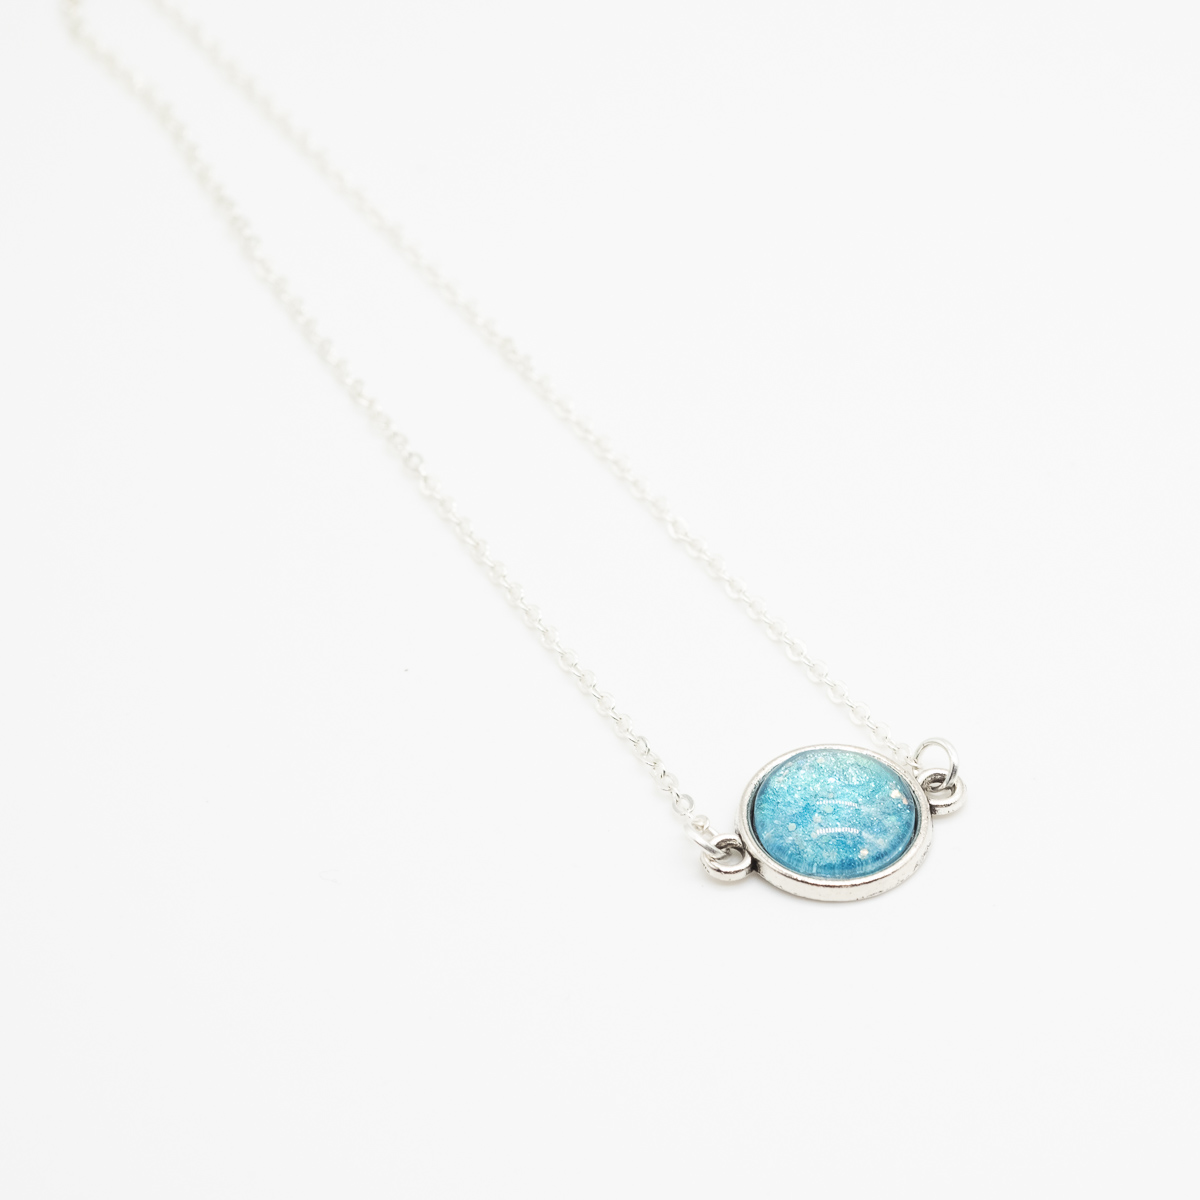 KET-116 handgeschilderde ketting blauw glitter